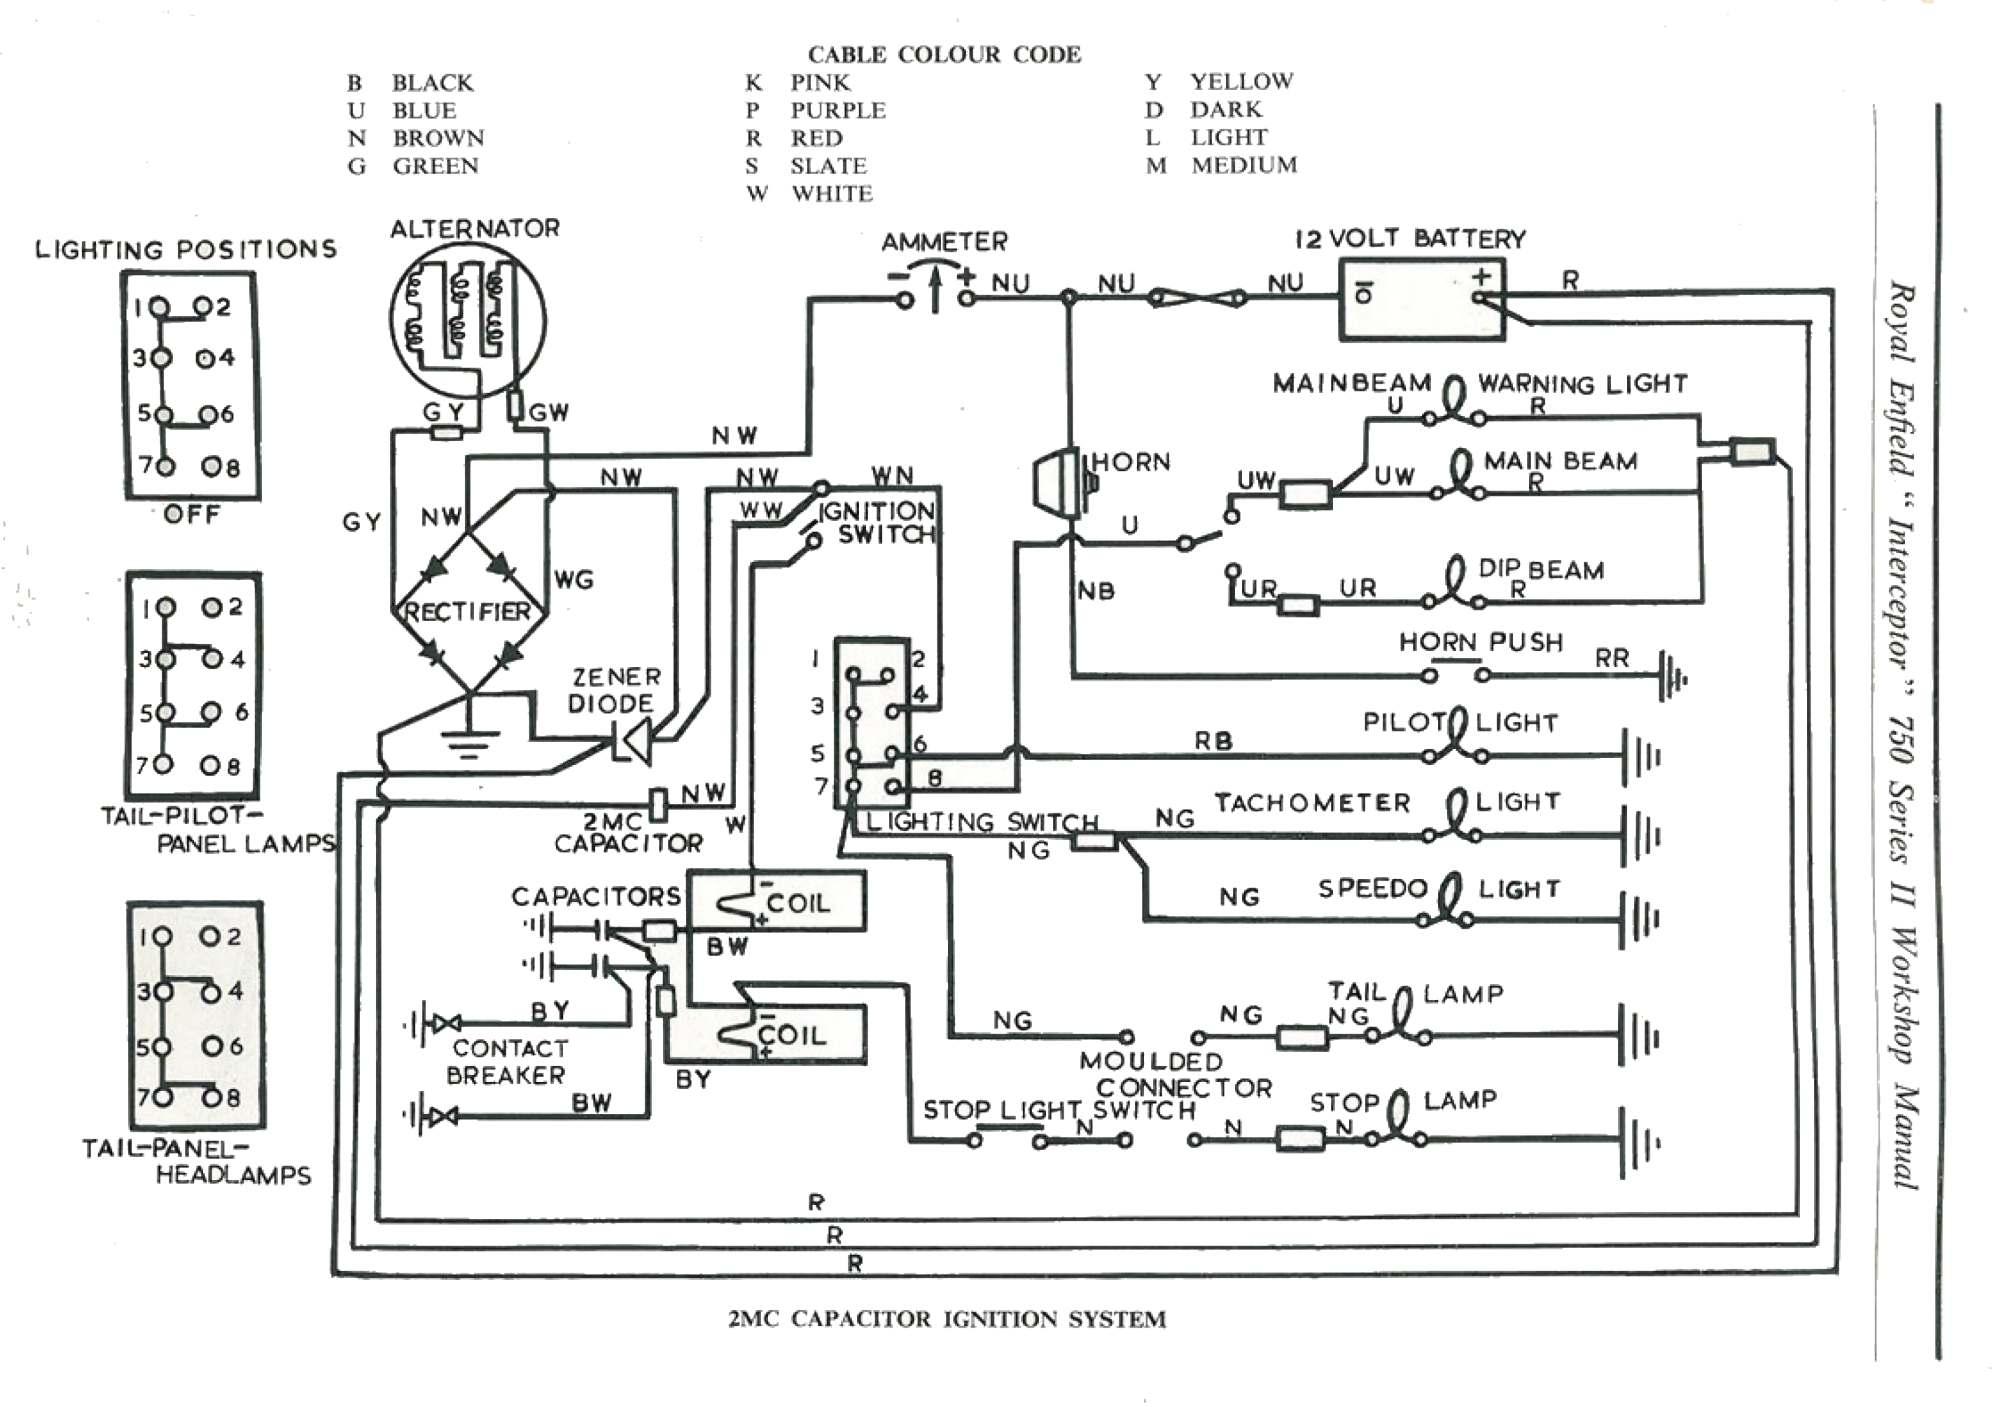 Royal Enfield 350 Wiring Diagram